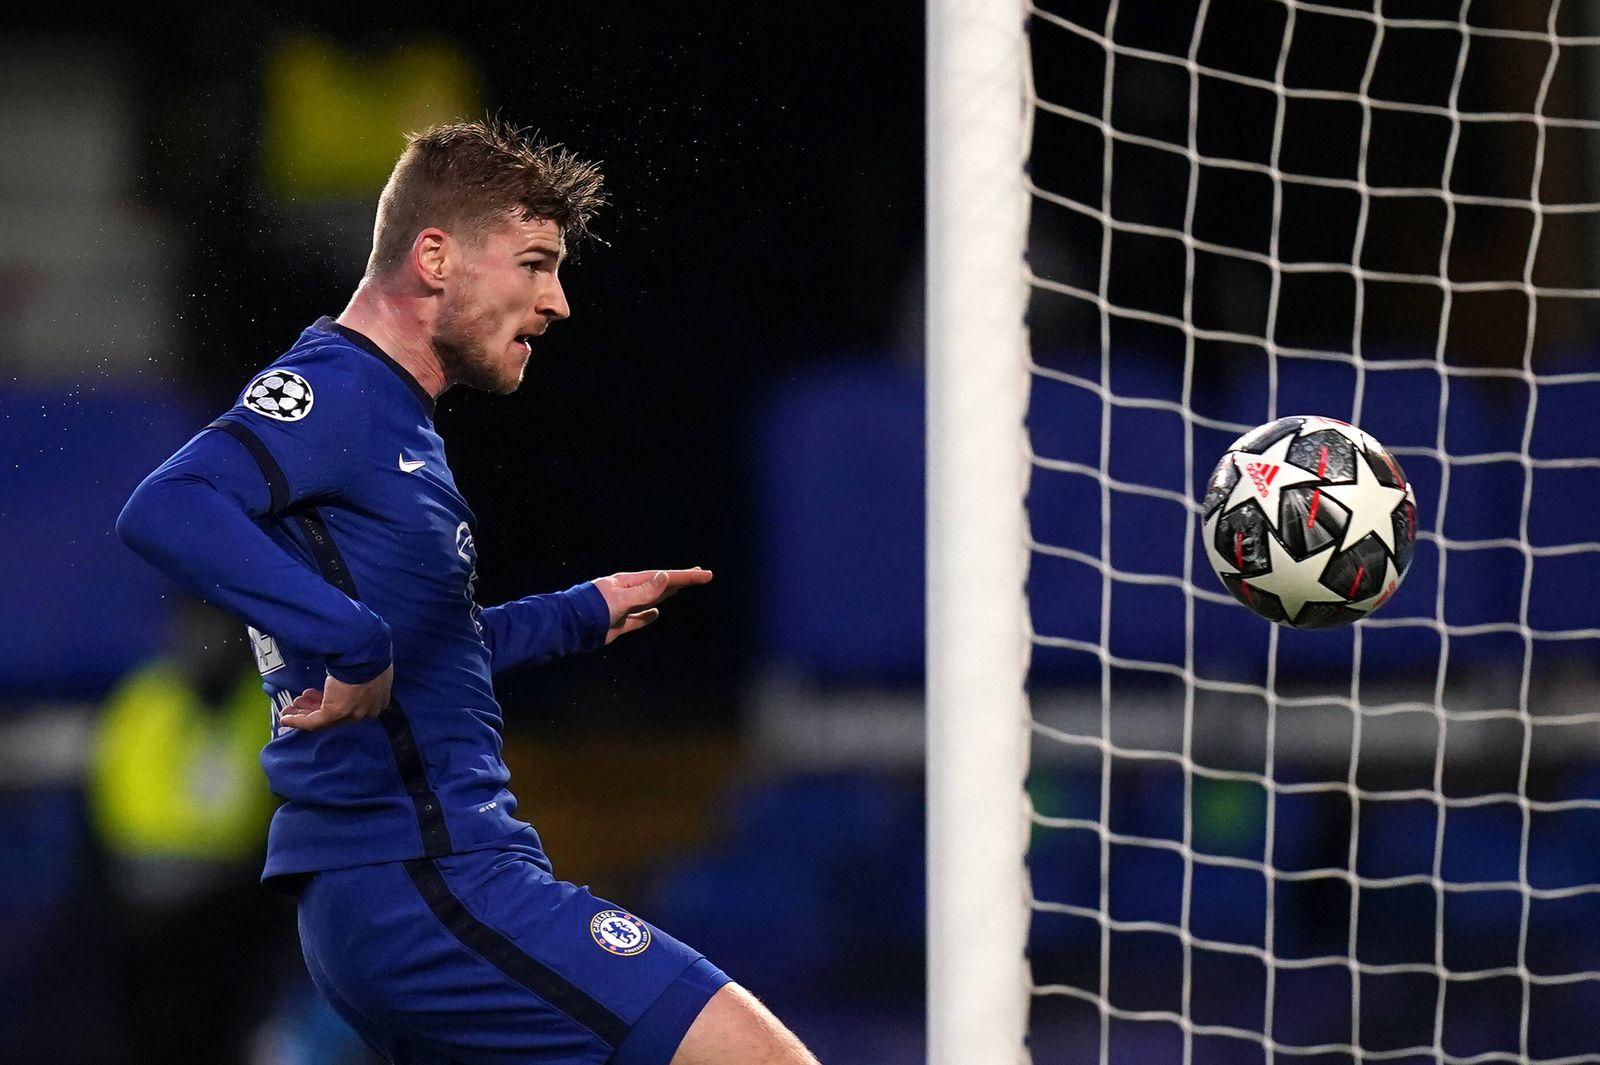 Sport Bilder des Tages Chelsea v Real Madrid - UEFA Champions League - Semi Final - Second Leg - Stamford Bridge Chelse